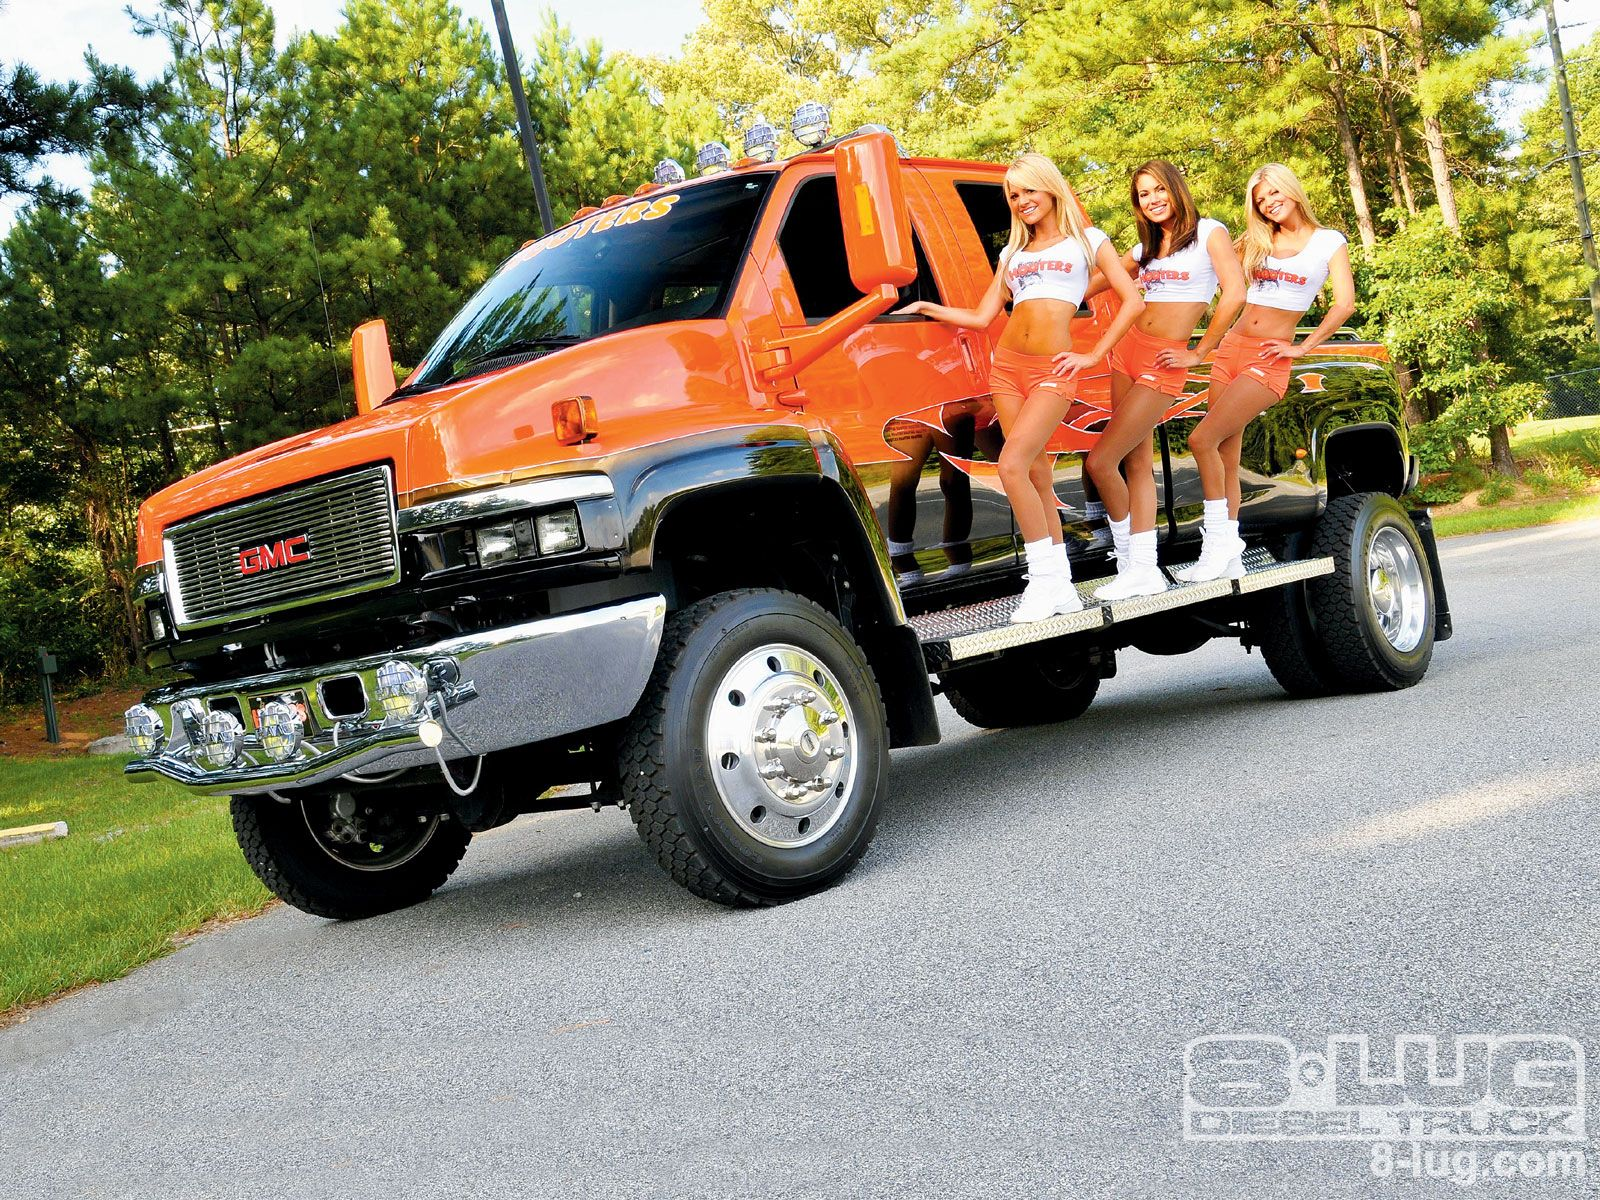 64b2112d77901d05d238c53bcdc50890 gmc topkick 4500 hooters girls off road pinterest vehicle